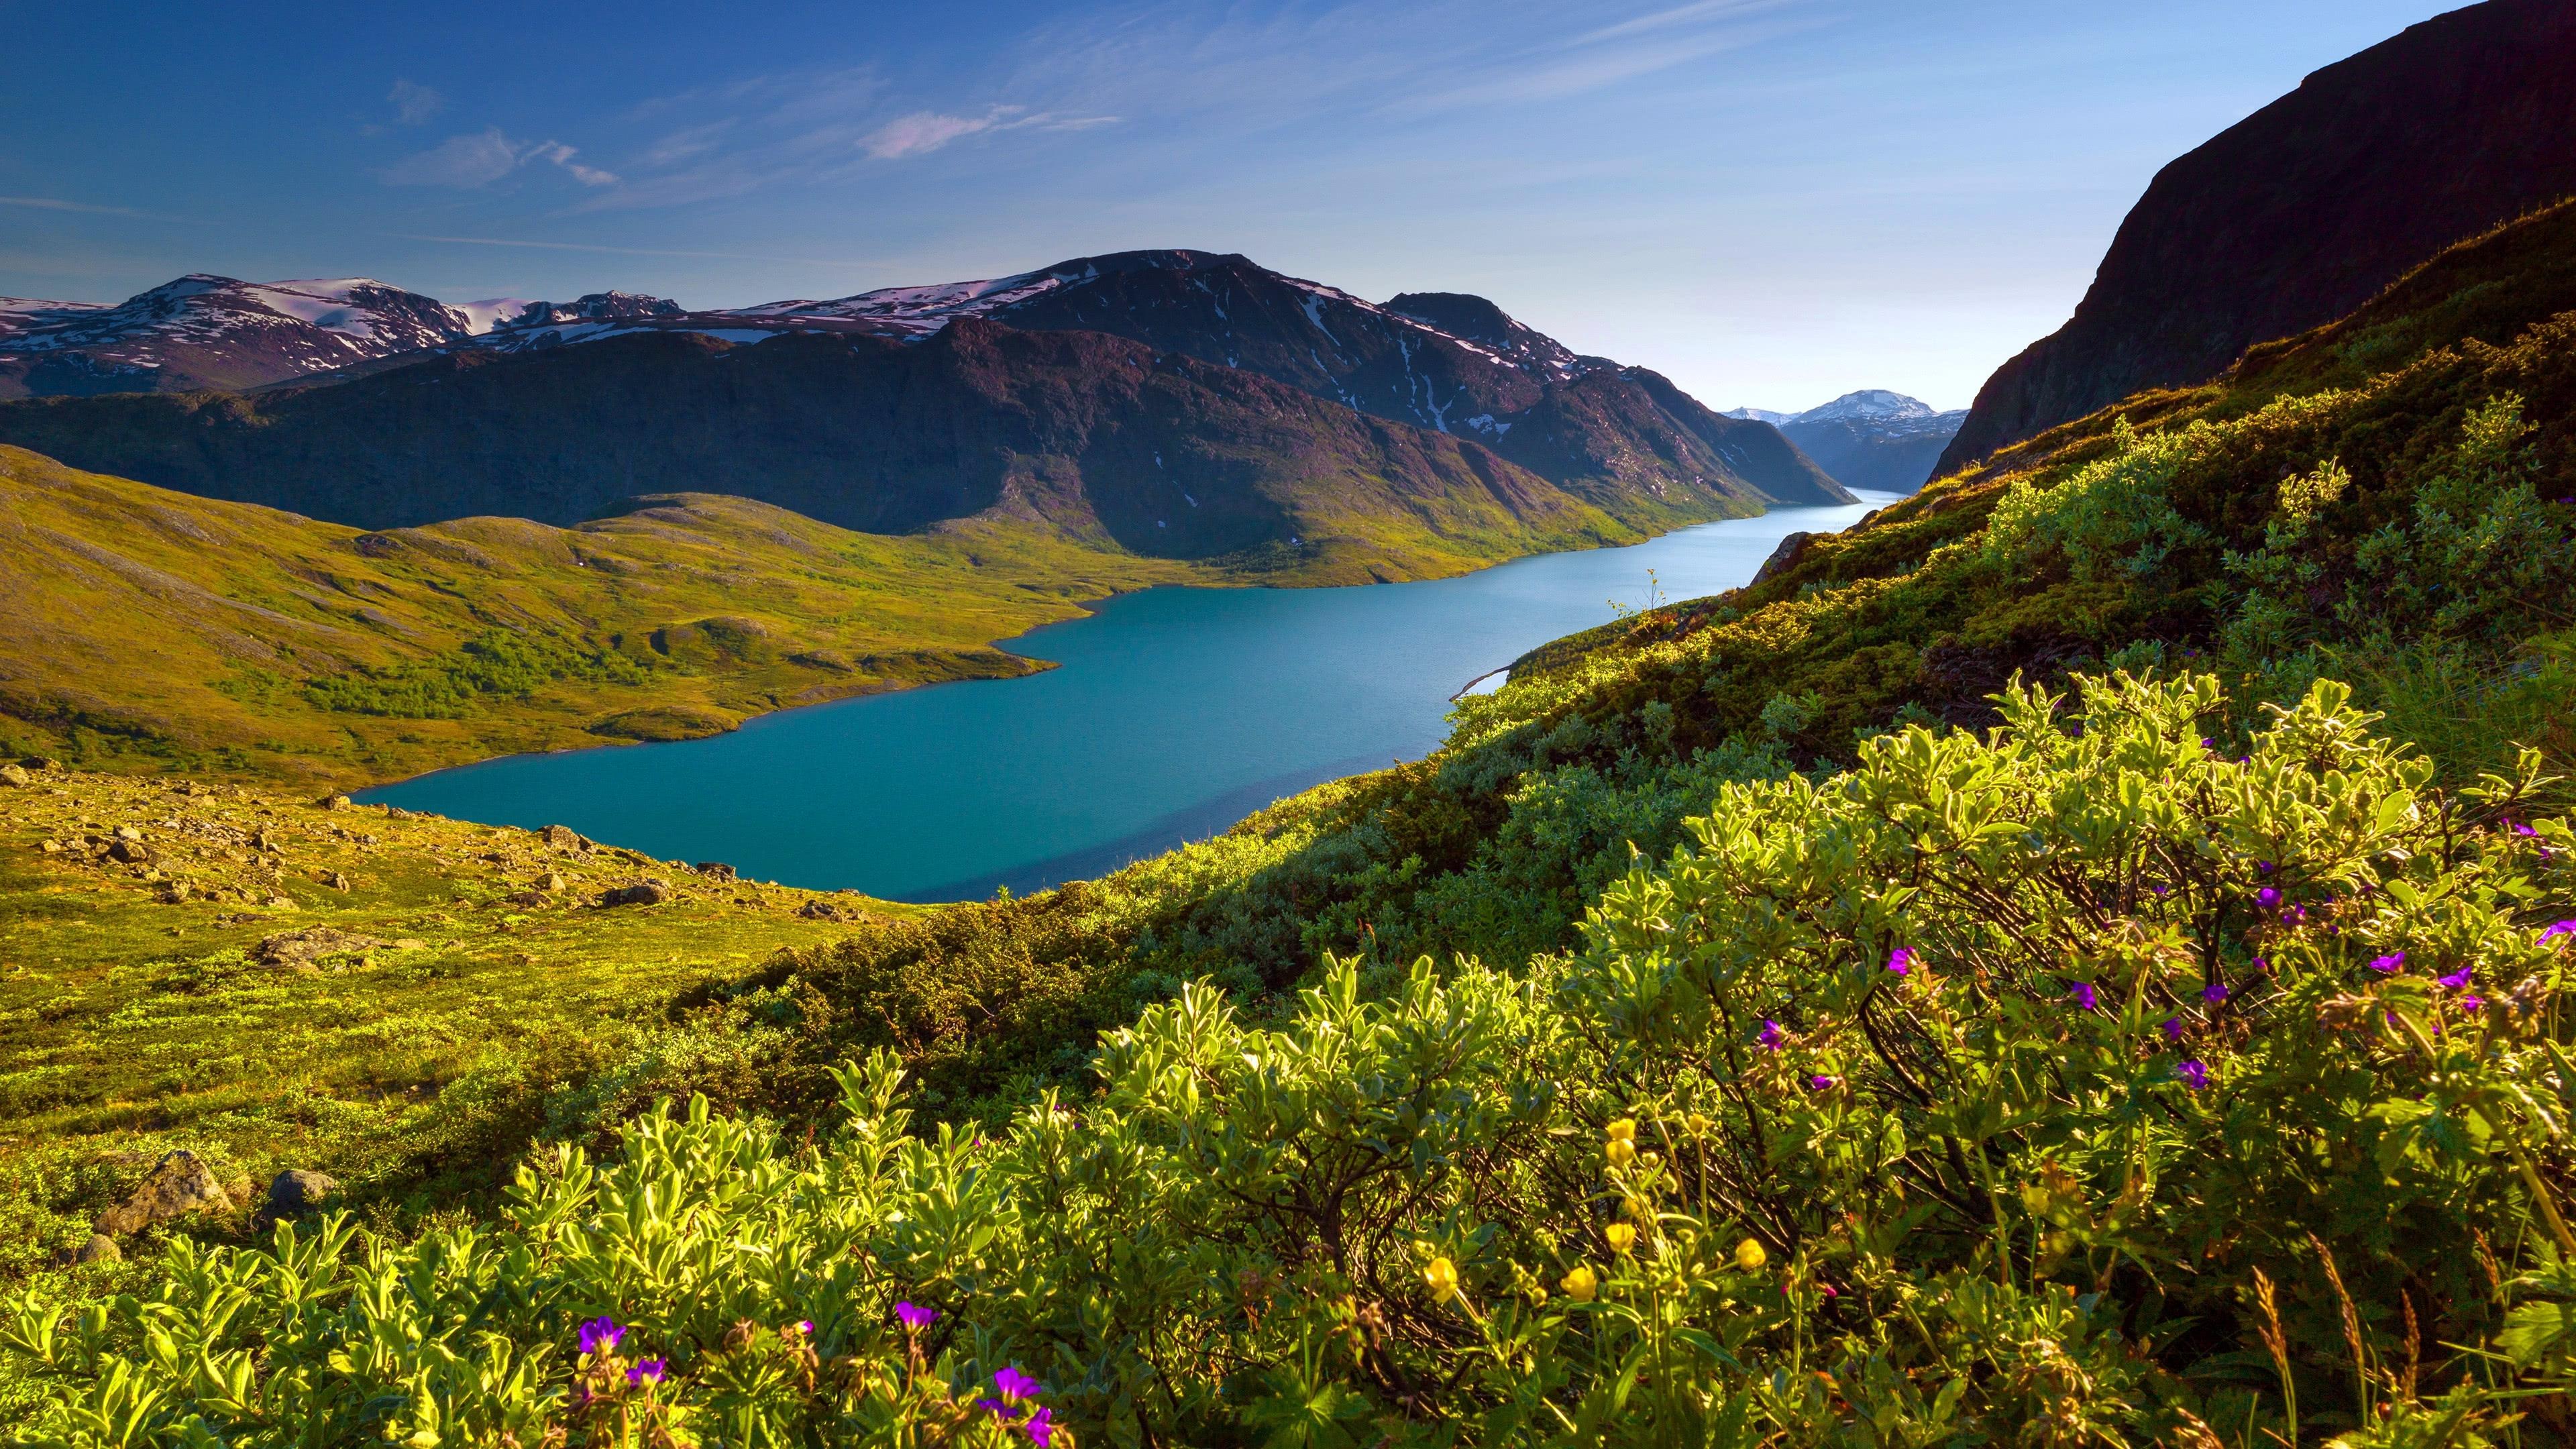 Jotunheimen National Park Mountain Range Norway Uhd 4k Wallpaper Pixelz